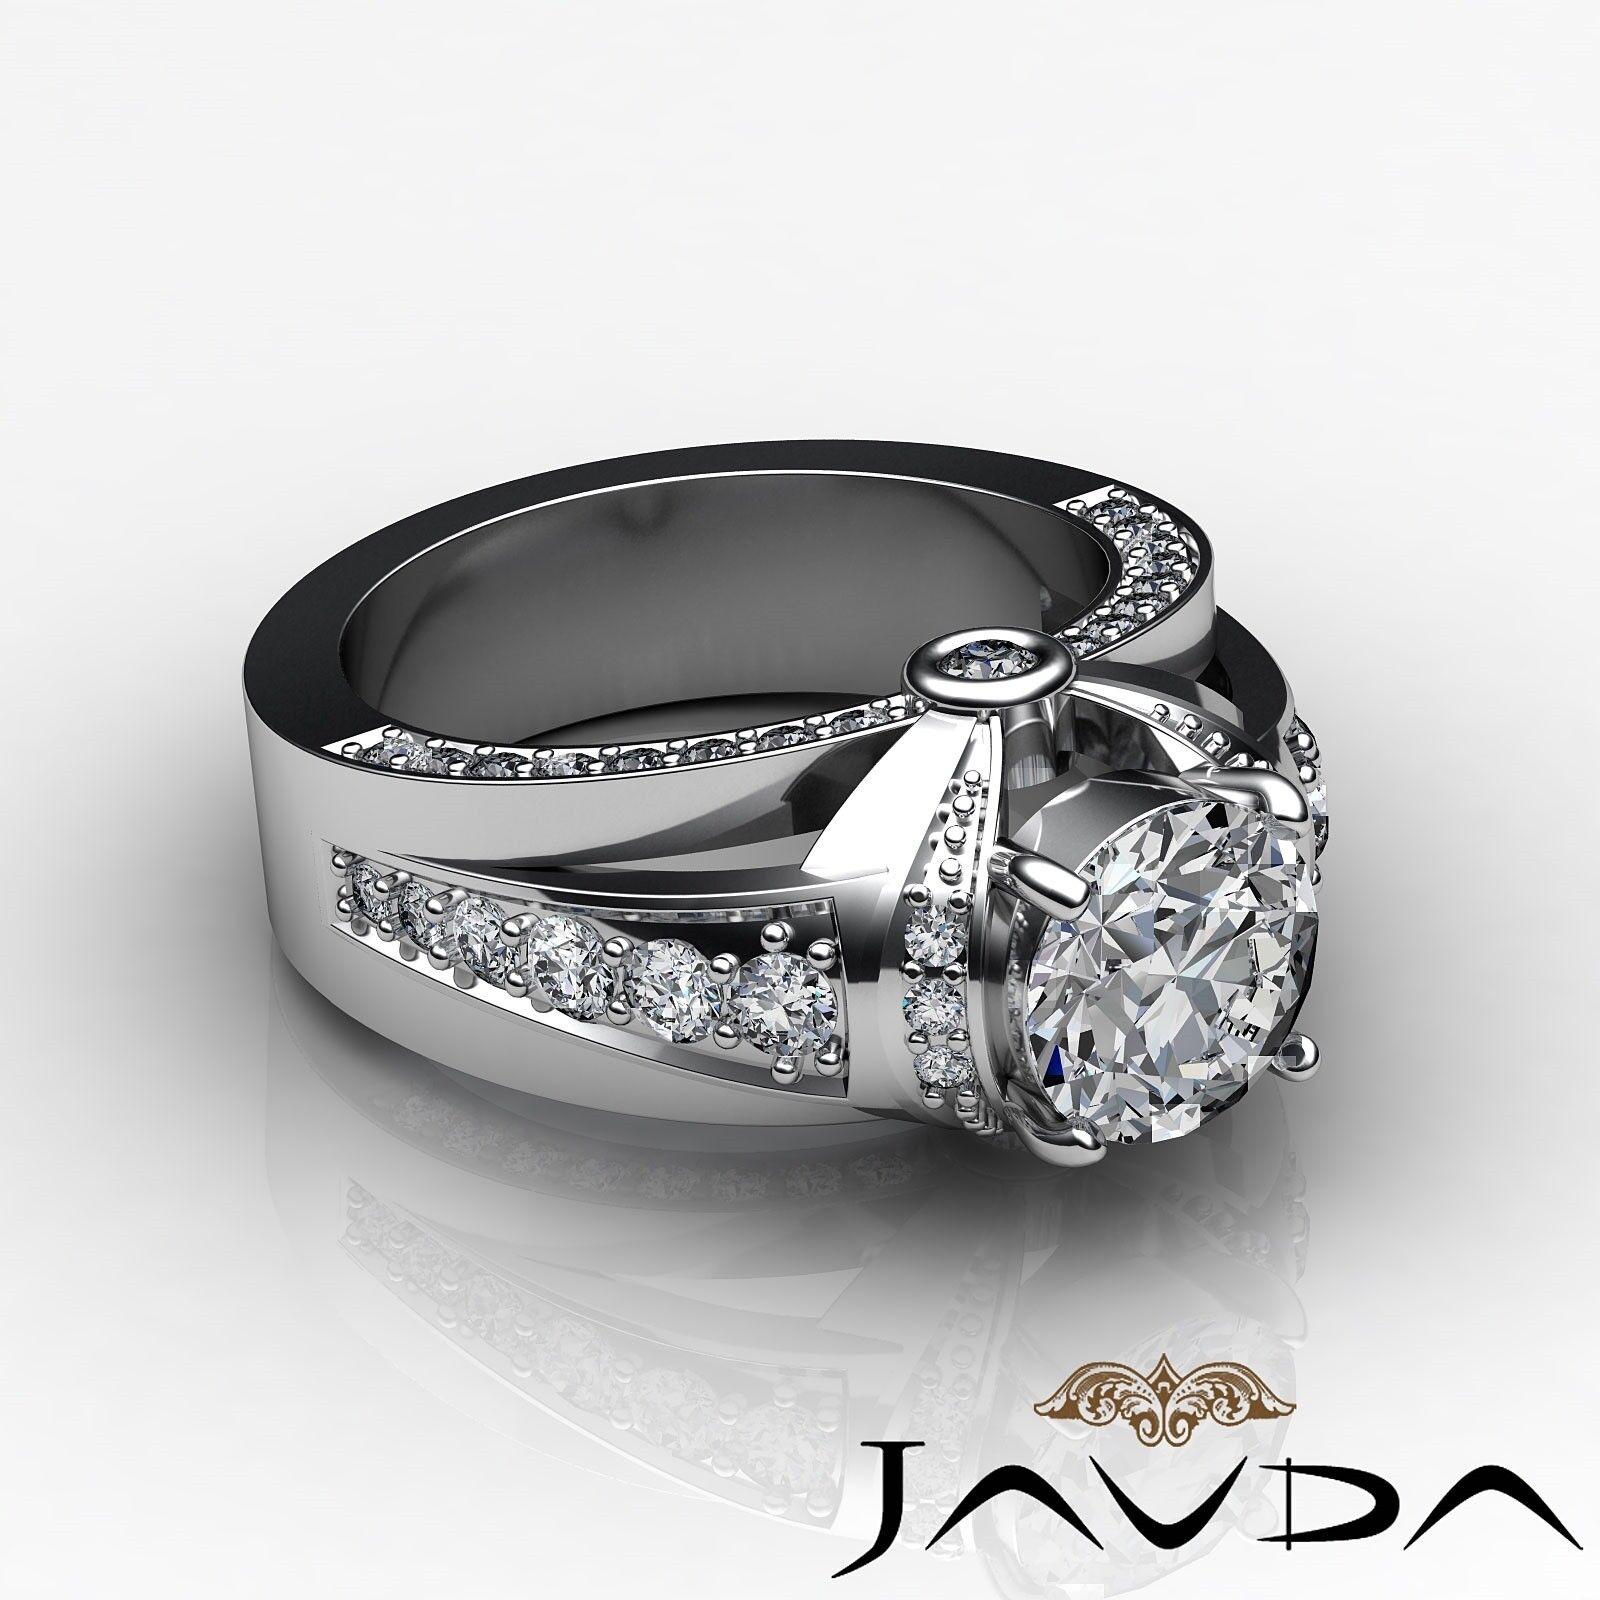 1.7ct Knot Classic Sidestone Round Diamond Engagement Ring GIA H-VVS2 White Gold 2